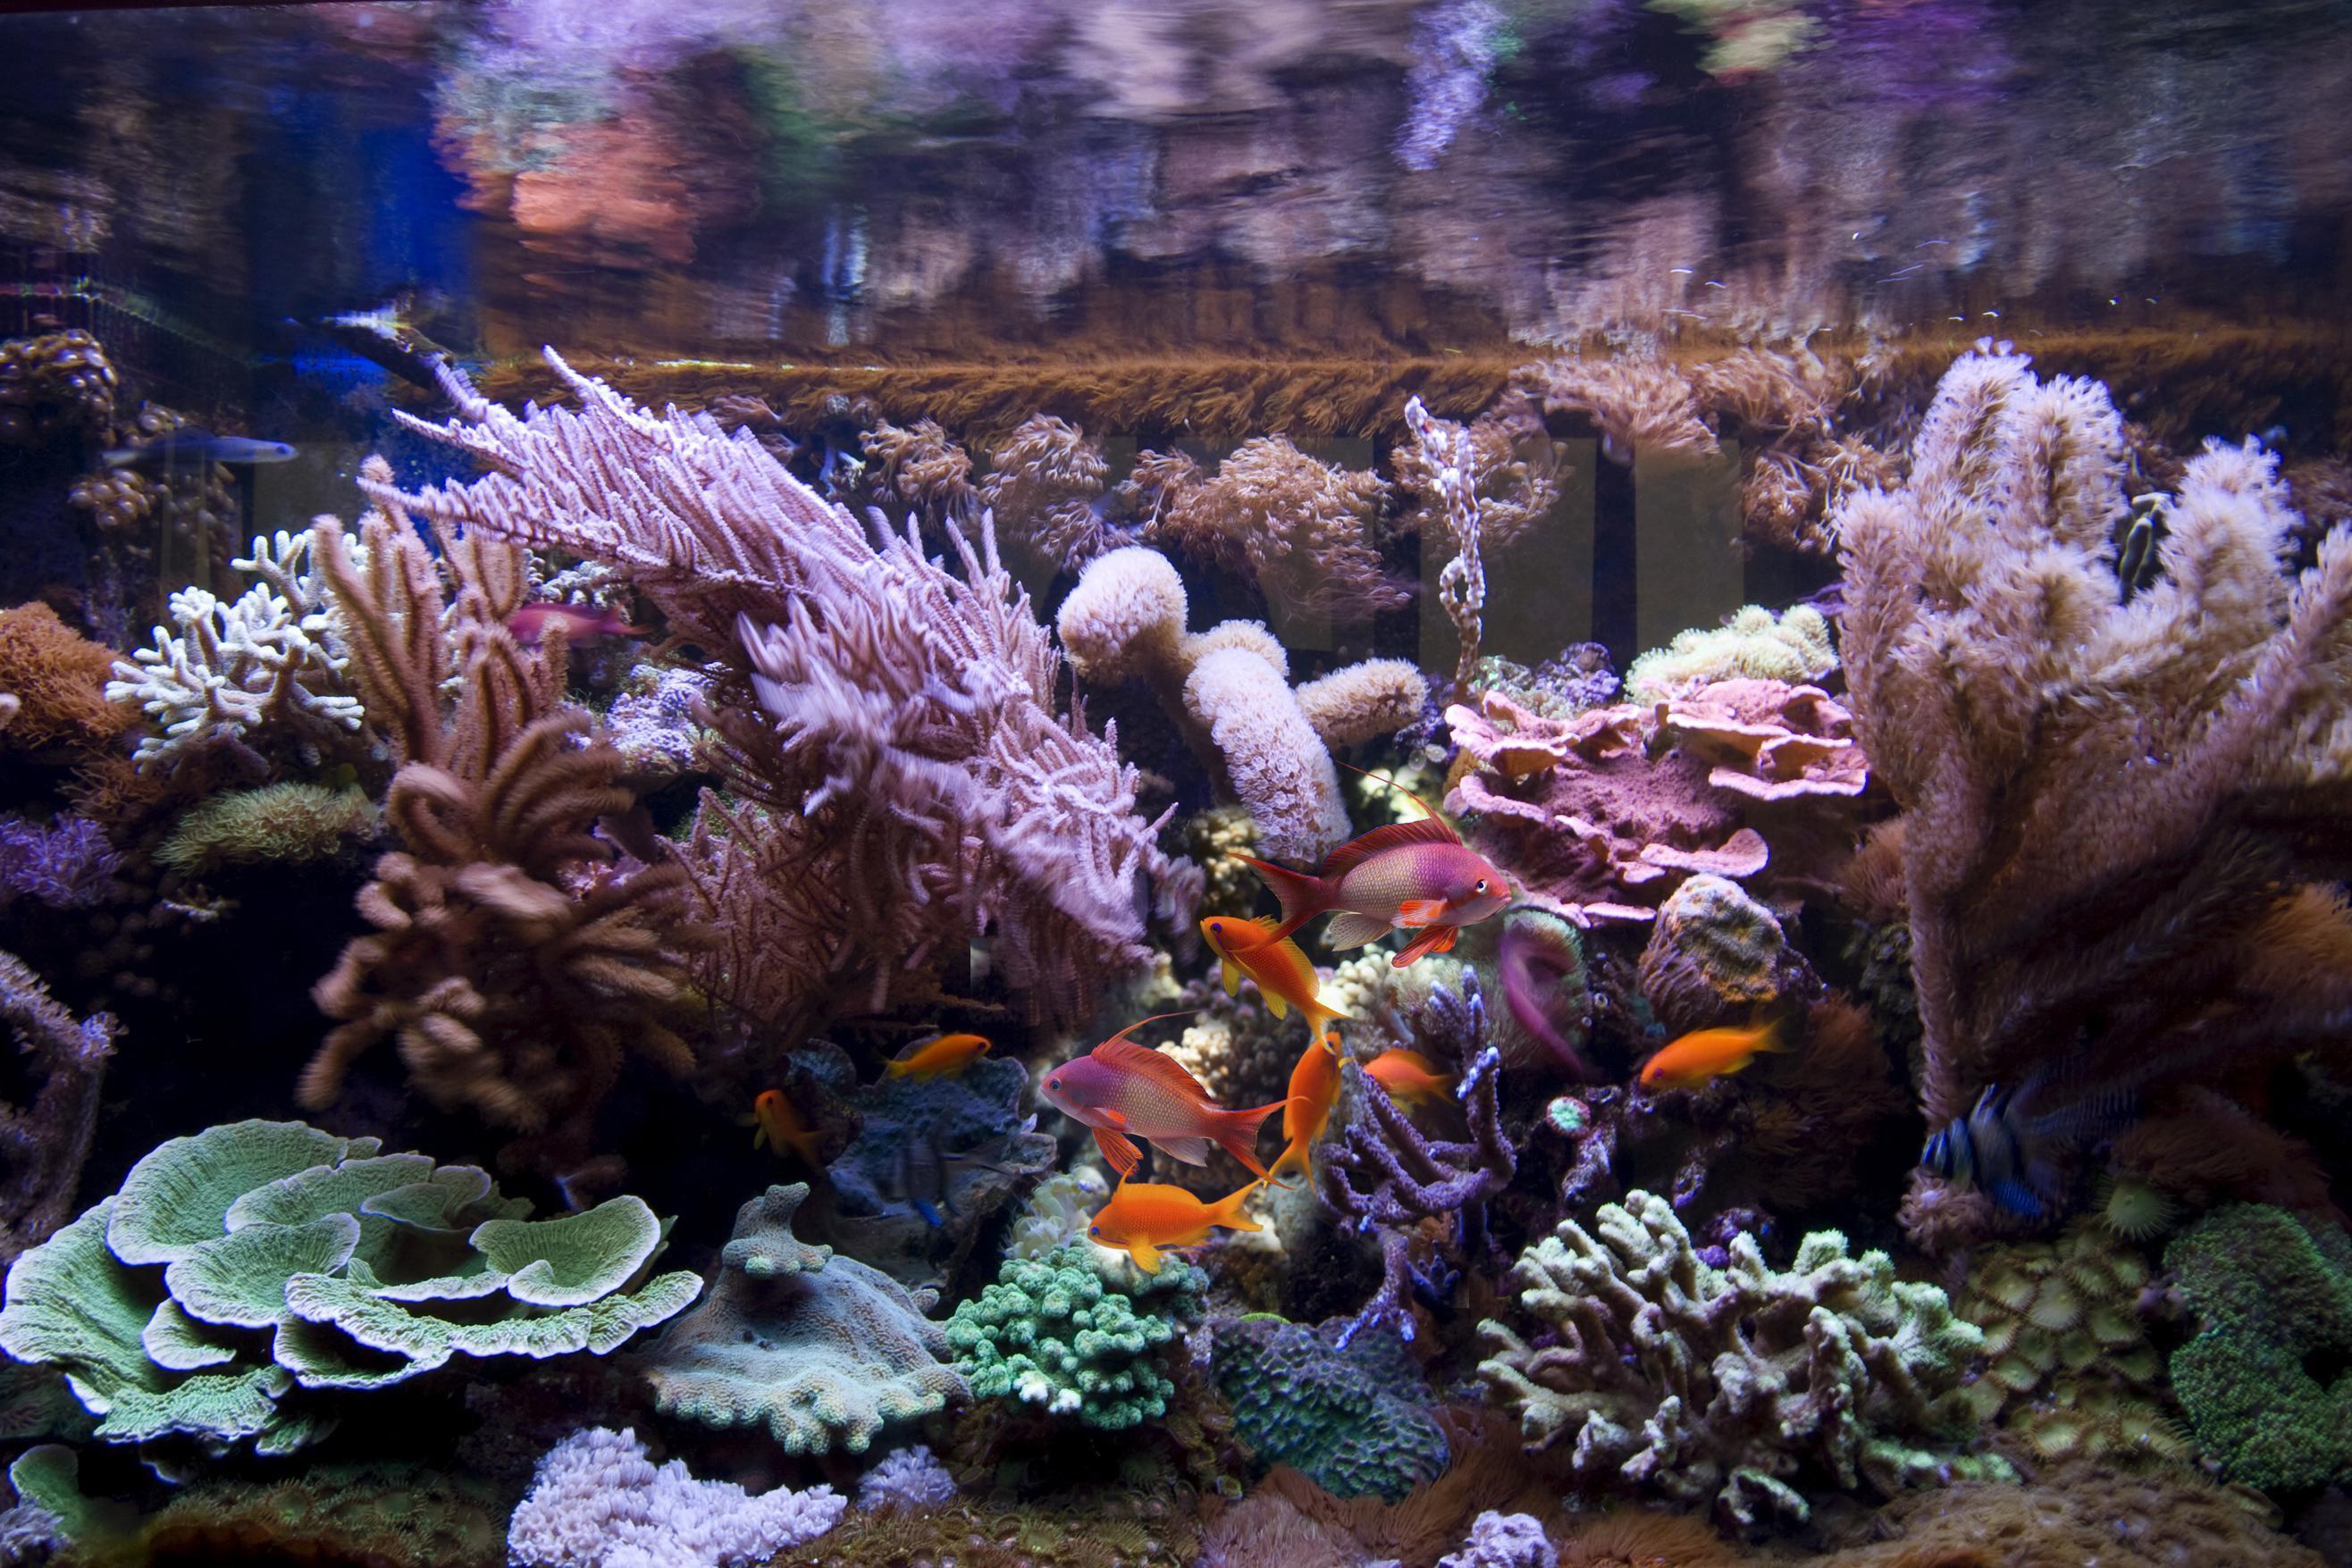 168264180-56a81f0a5f9b58b7d0f0db3b Frais De Aquarium Recifal Complet Concept